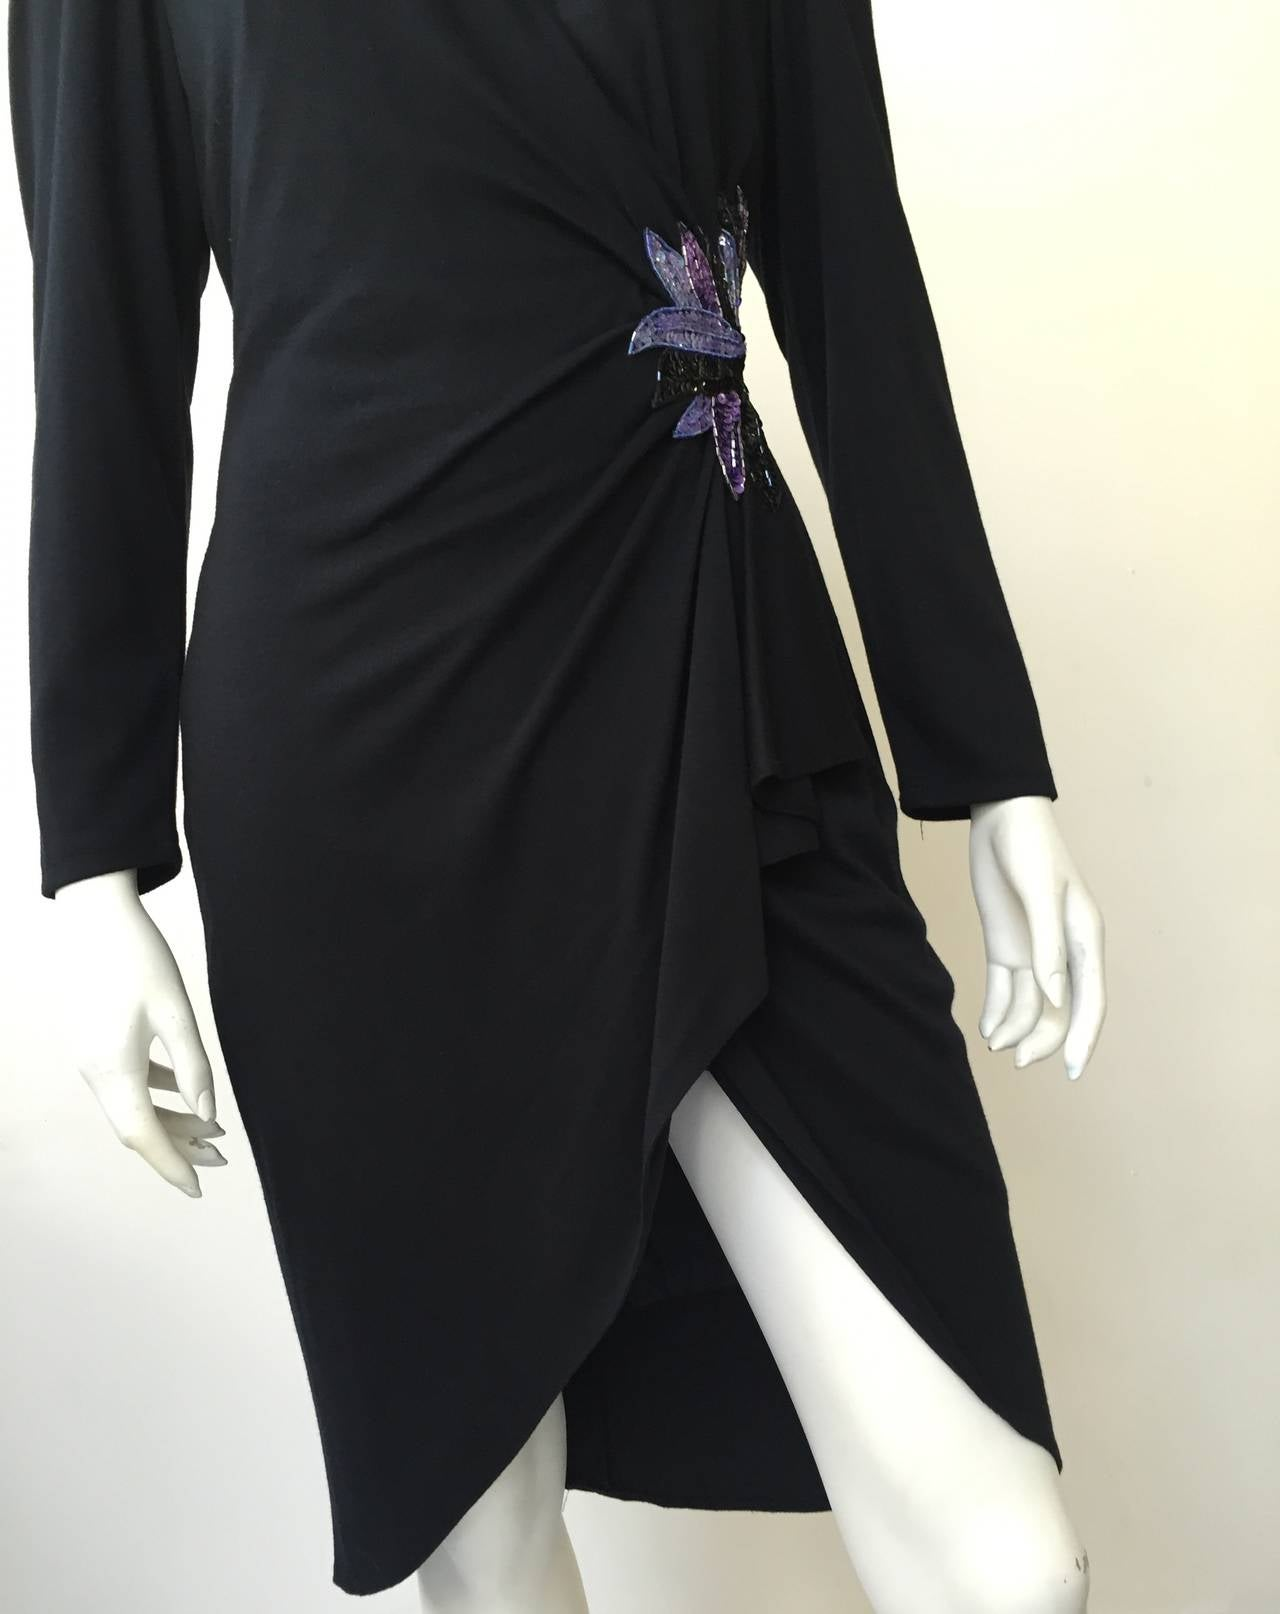 Zandra Rhodes 1980s Black with Sequin Dress Size 6. 4